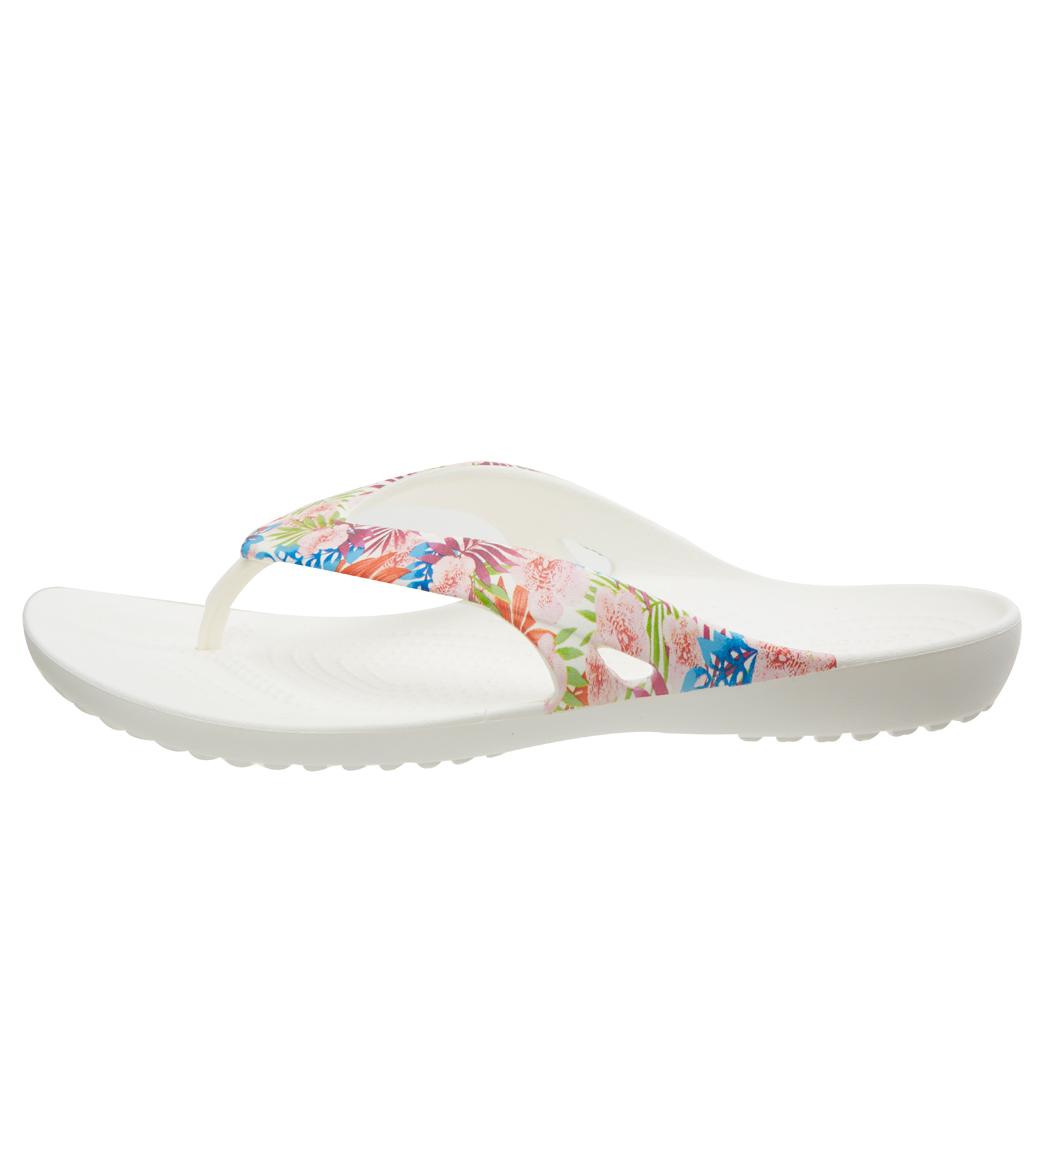 3096787f26eb2 Crocs Women s Kadee II Graphic Flip Flop at SwimOutlet.com